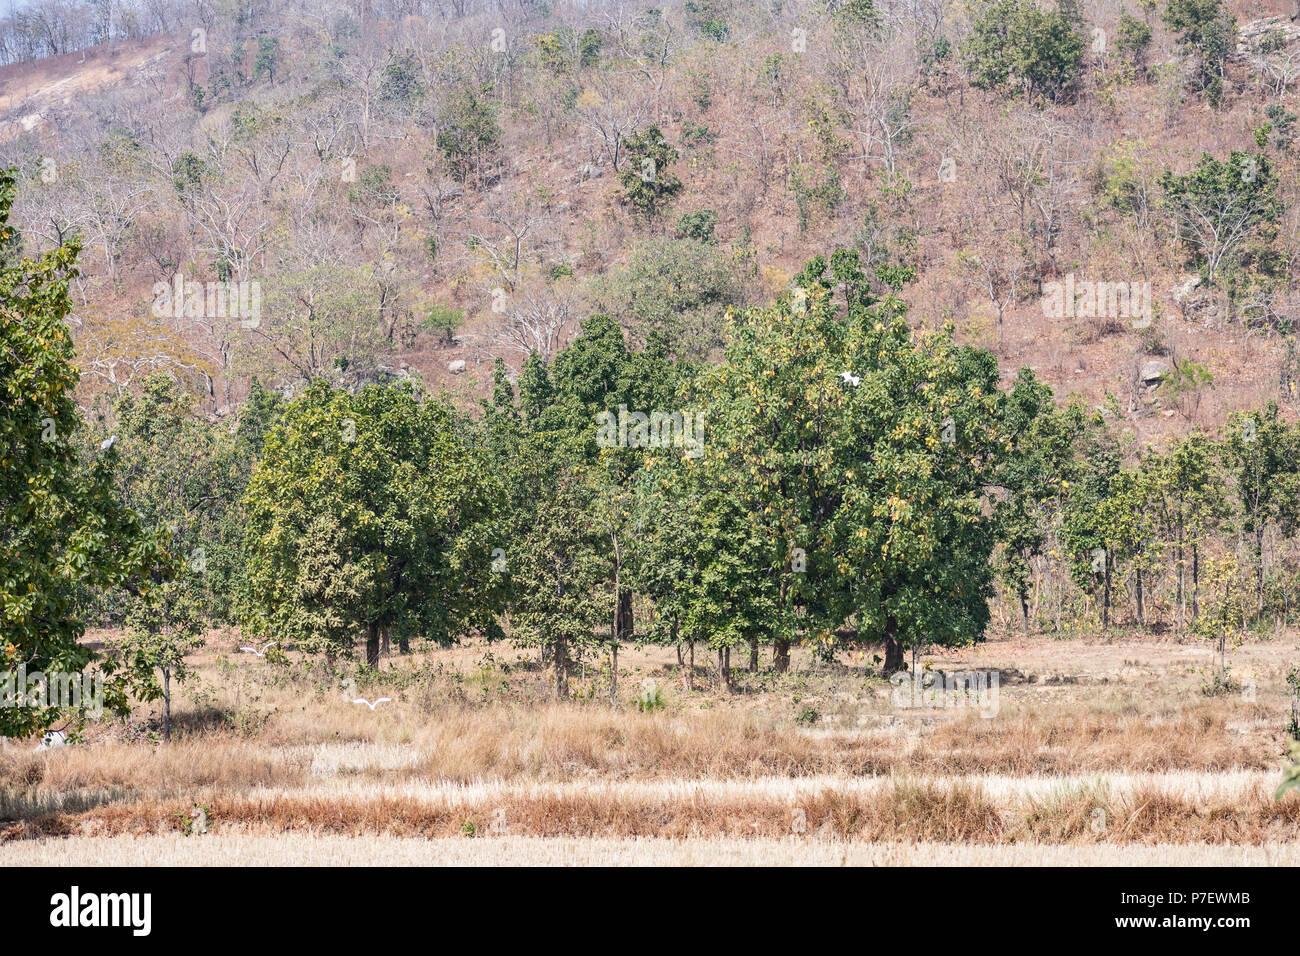 Harvesting Trees Stock Photos Amp Harvesting Trees Stock